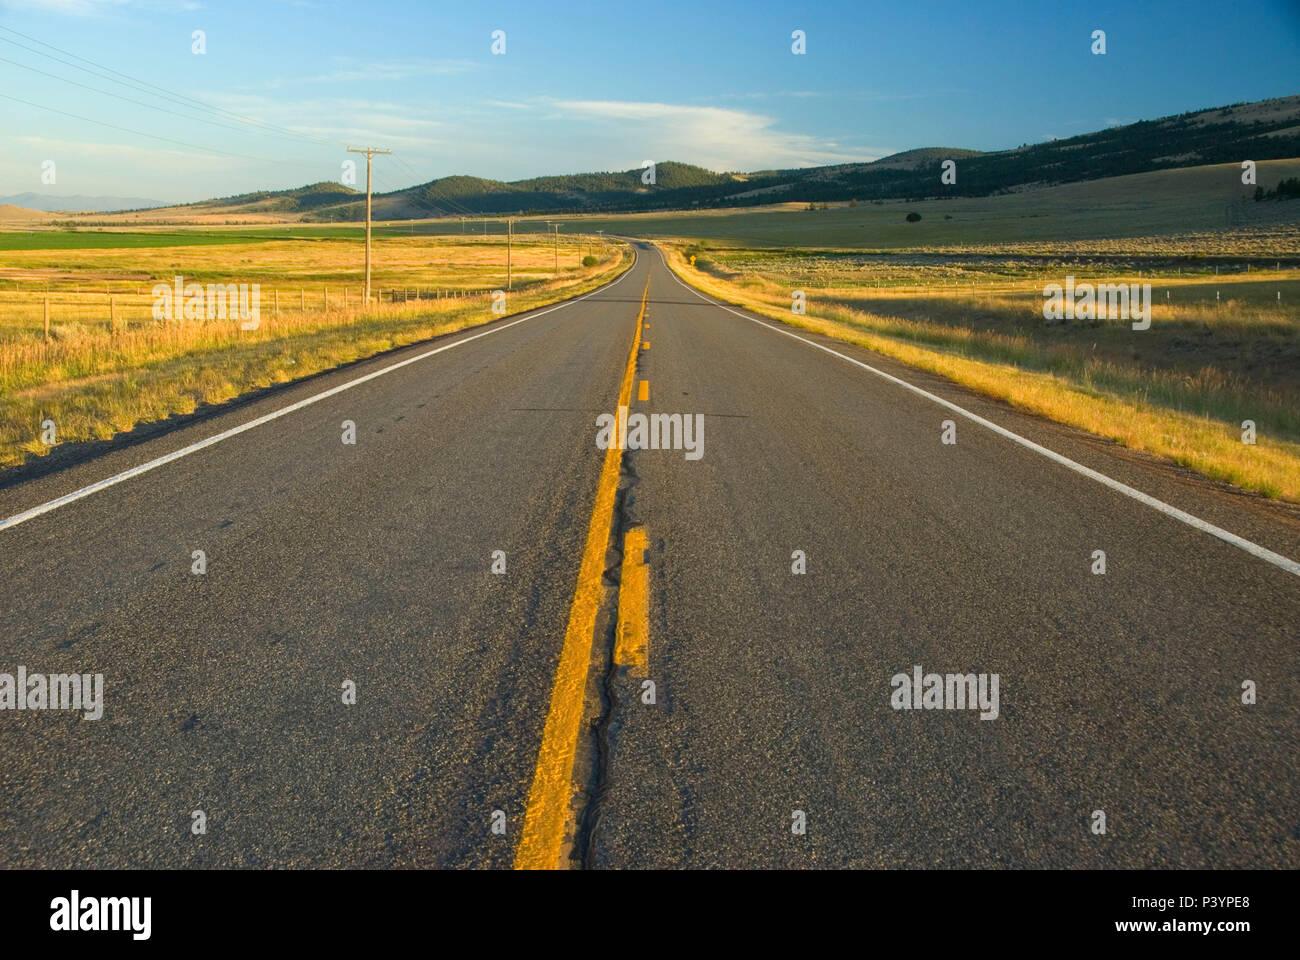 Montana Highway 279, Lewis and Clark County, Montana - Stock Image